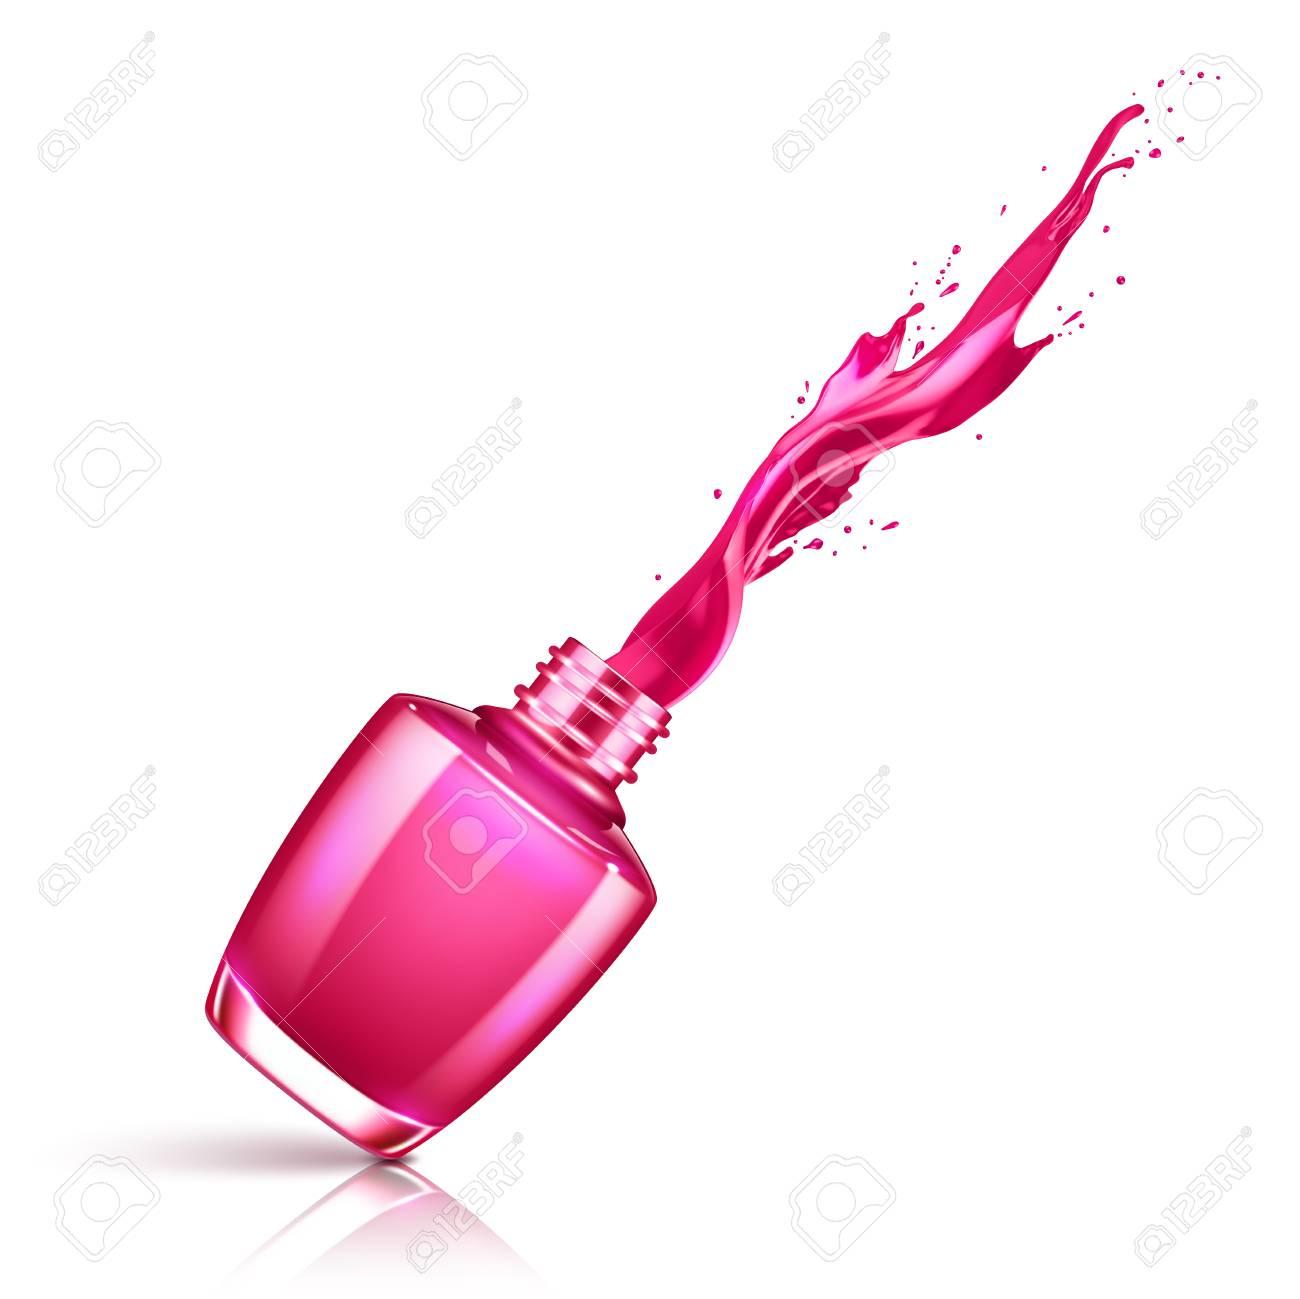 Nail polish splashing from the bottle.